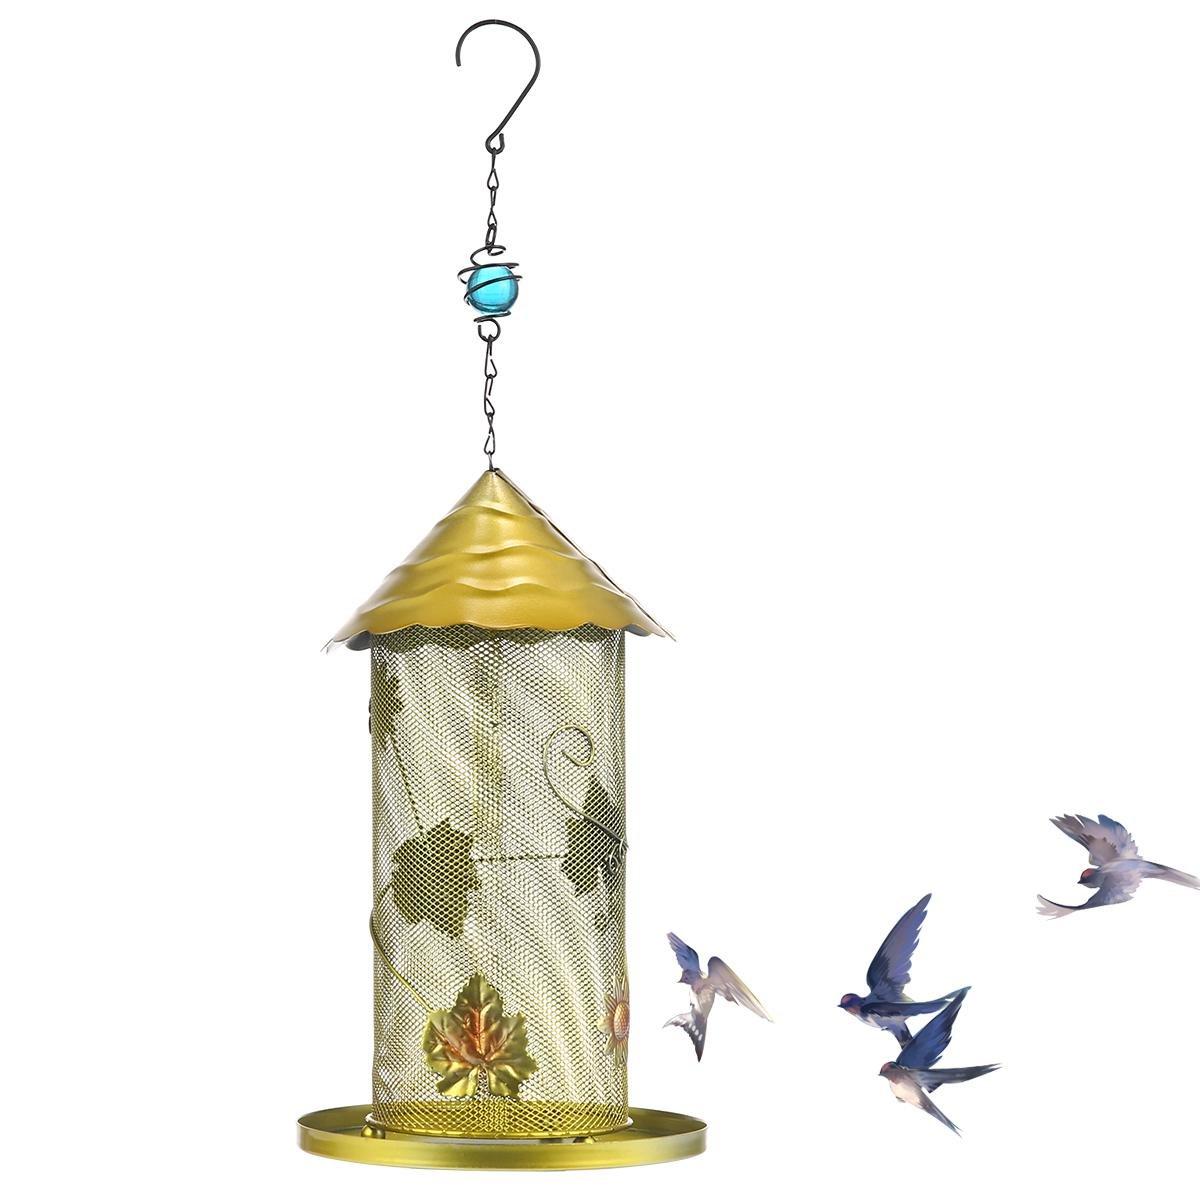 KOBWA Outdoor Bird Pet Feeder Waterer Garden Hanging Clear Type for Lovebird Bird Feeder Farming Equipment